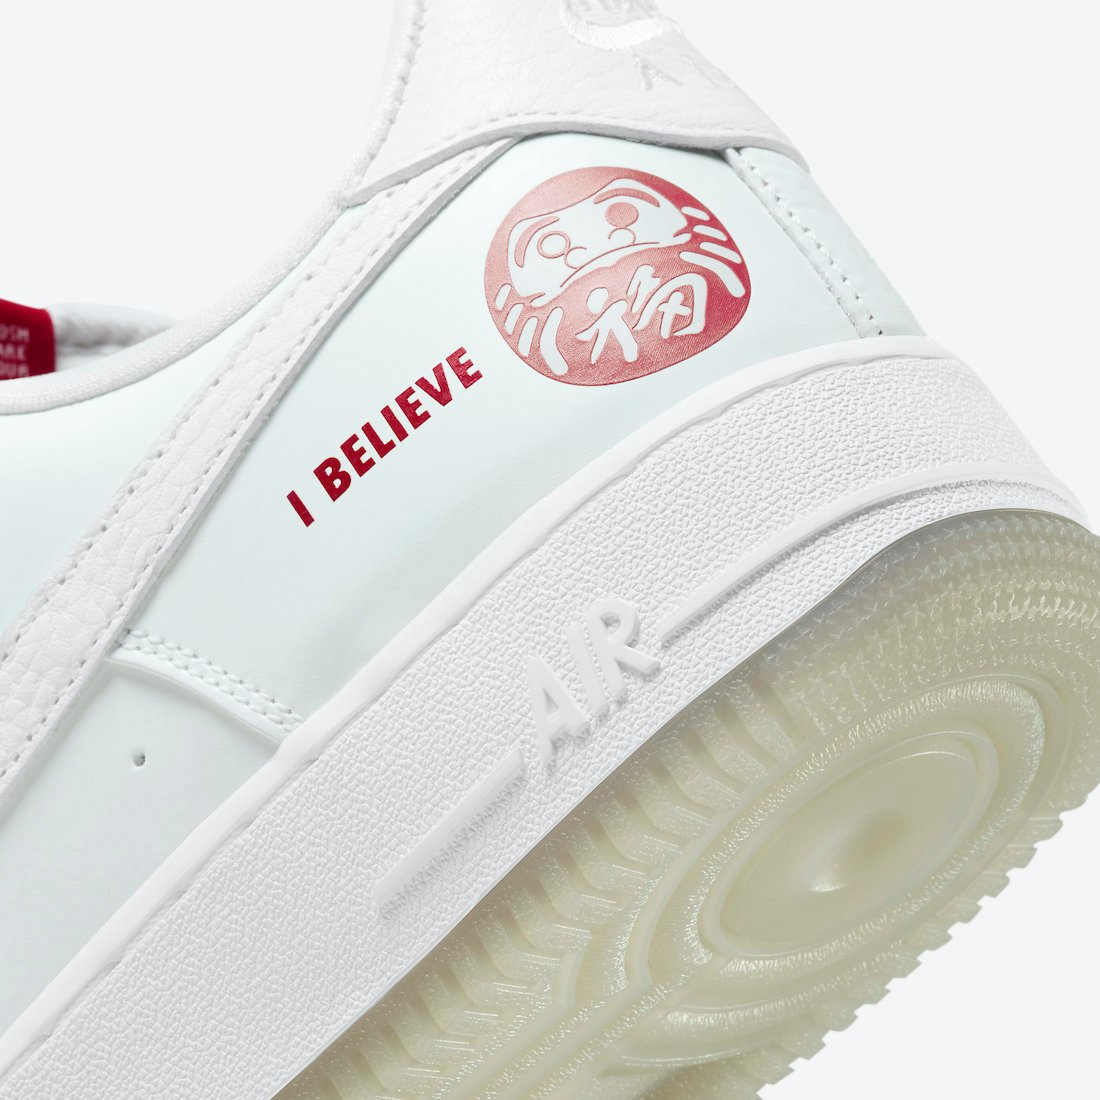 Nike Air Force 1 Low I Believe Nike Air Force 1 Low I Believe DD9941-100 Release Date Info Release Date Info